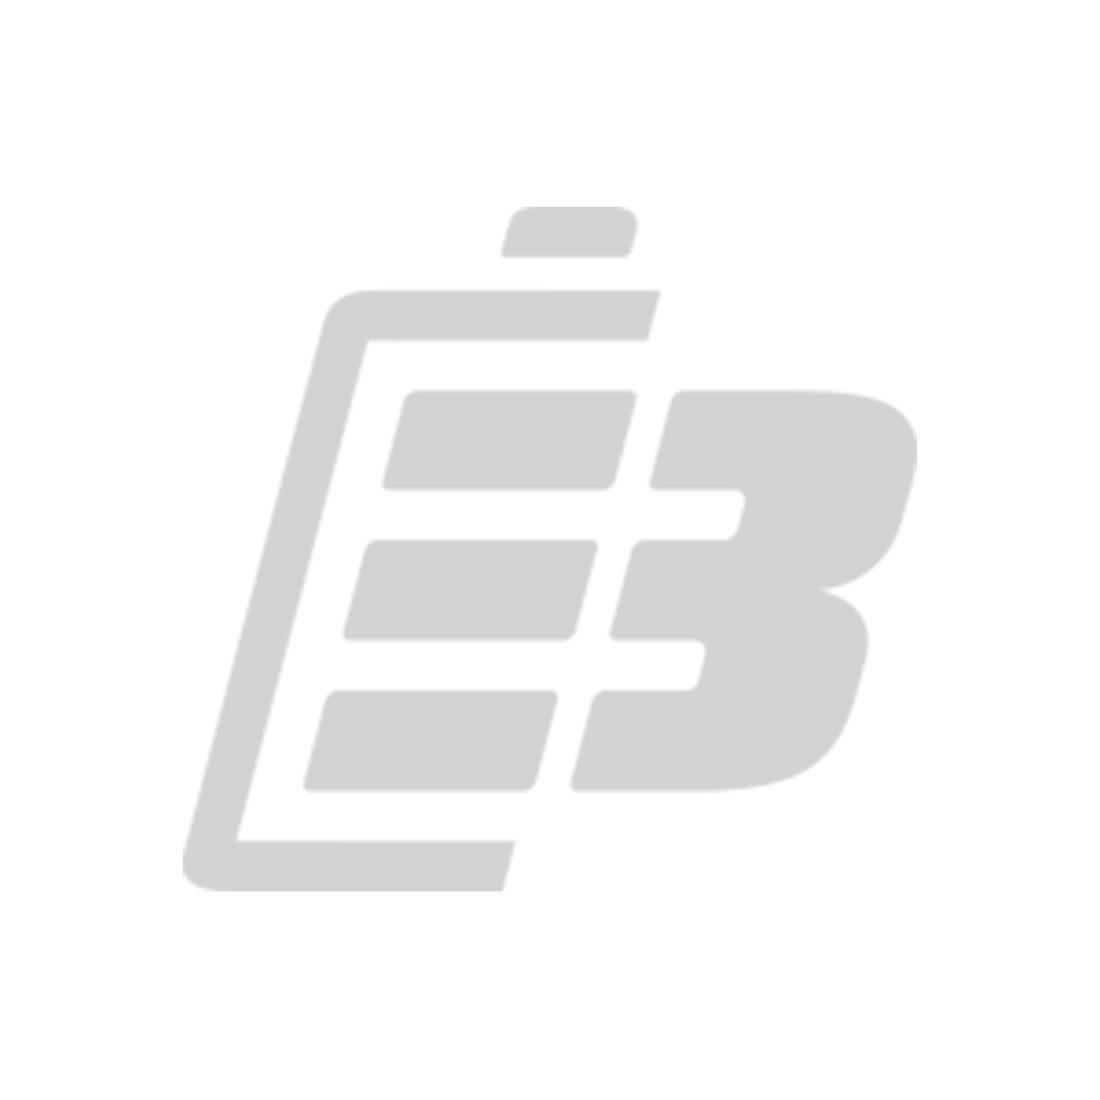 Drone battery Walkera Runner 250_1